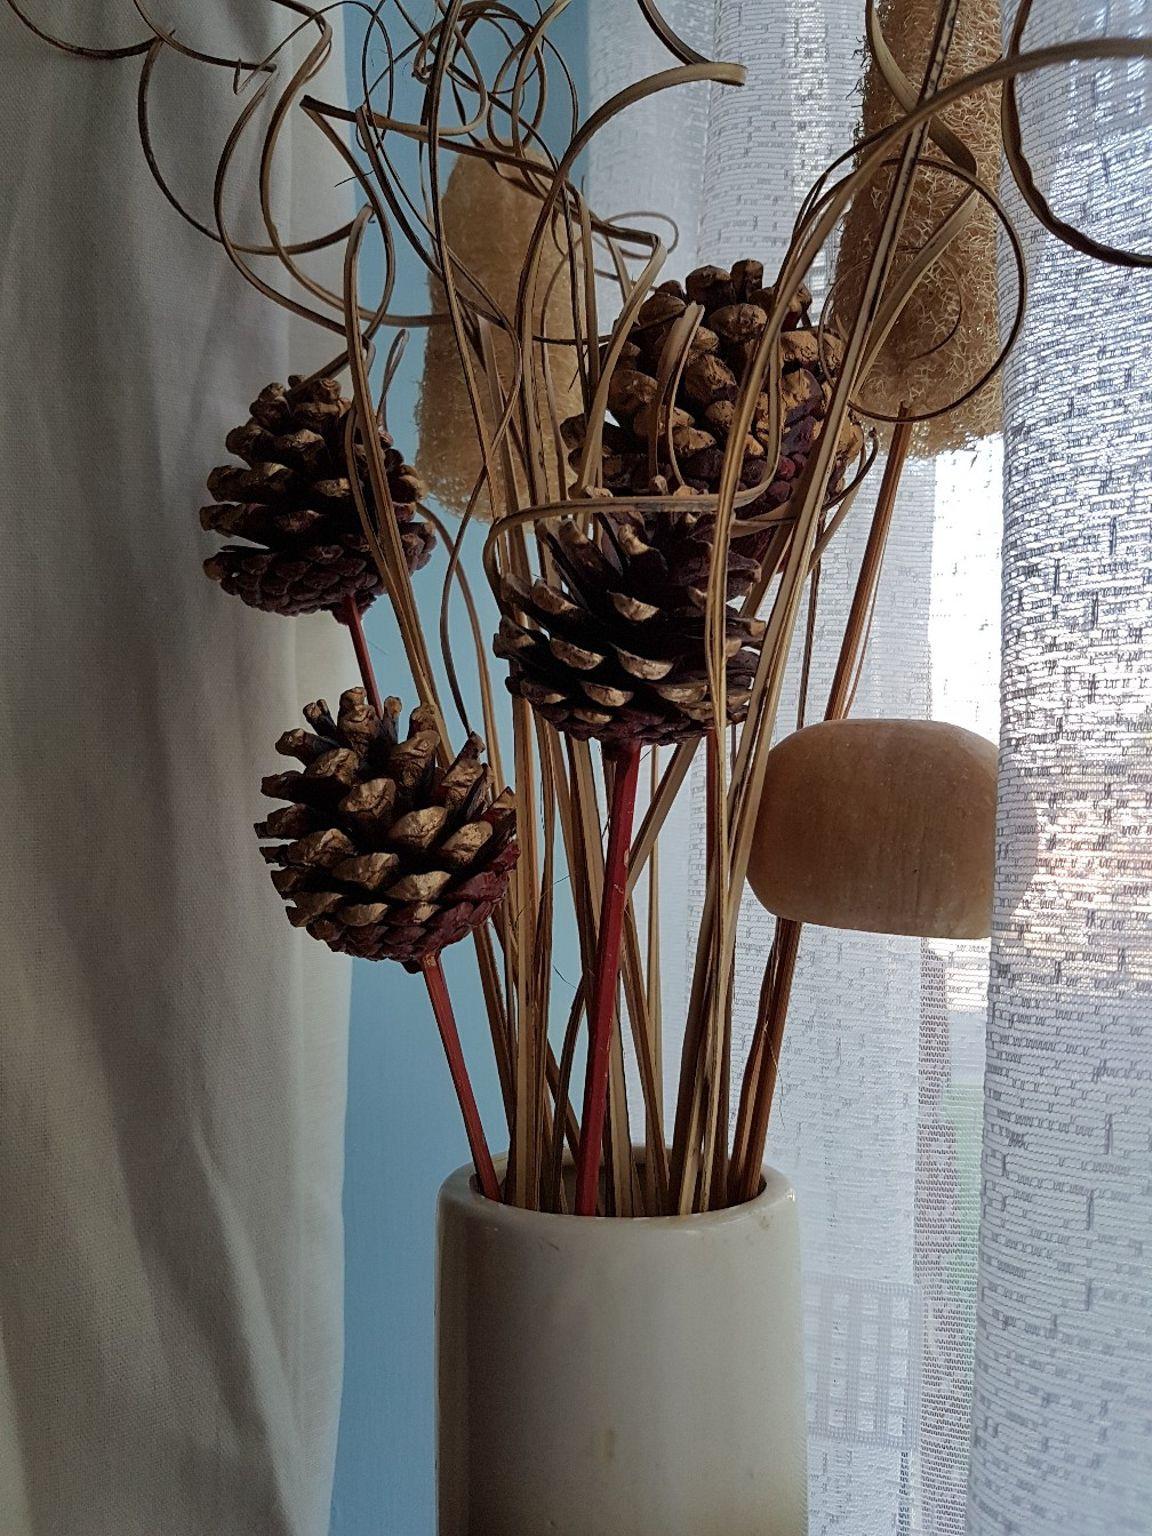 ralph lauren sloane vase of https en shpock com i wxeq4ikrbho4mdnp 2017 07 24t172547 in vase and flower arrangement 21ca45da